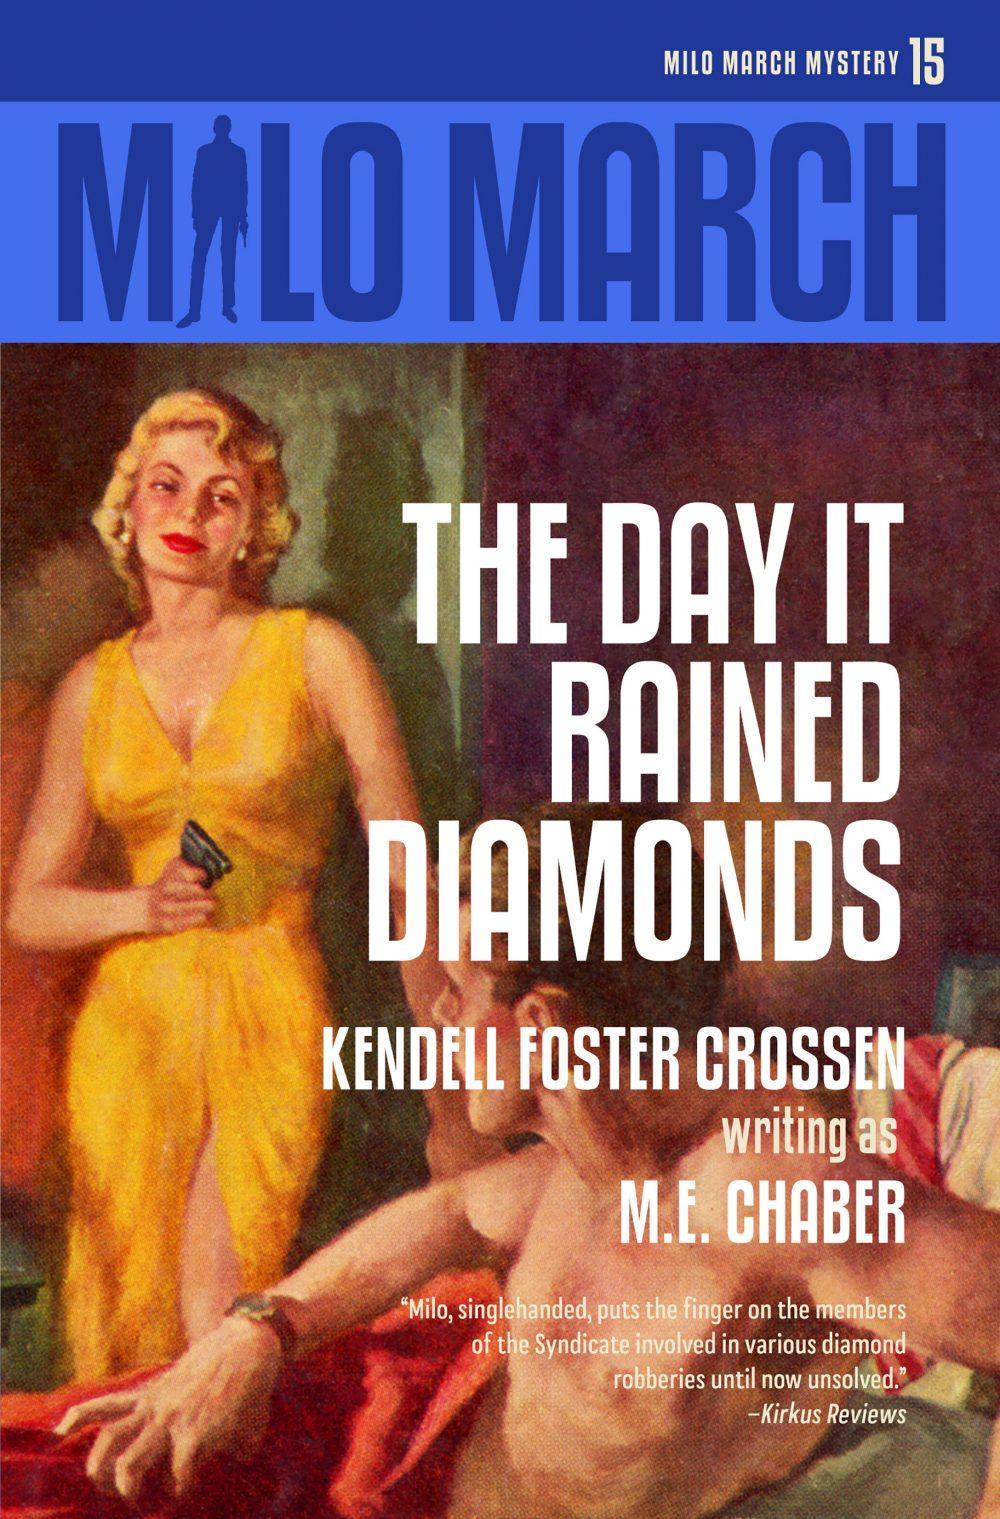 Milo March #15: The Day It Rained Diamonds